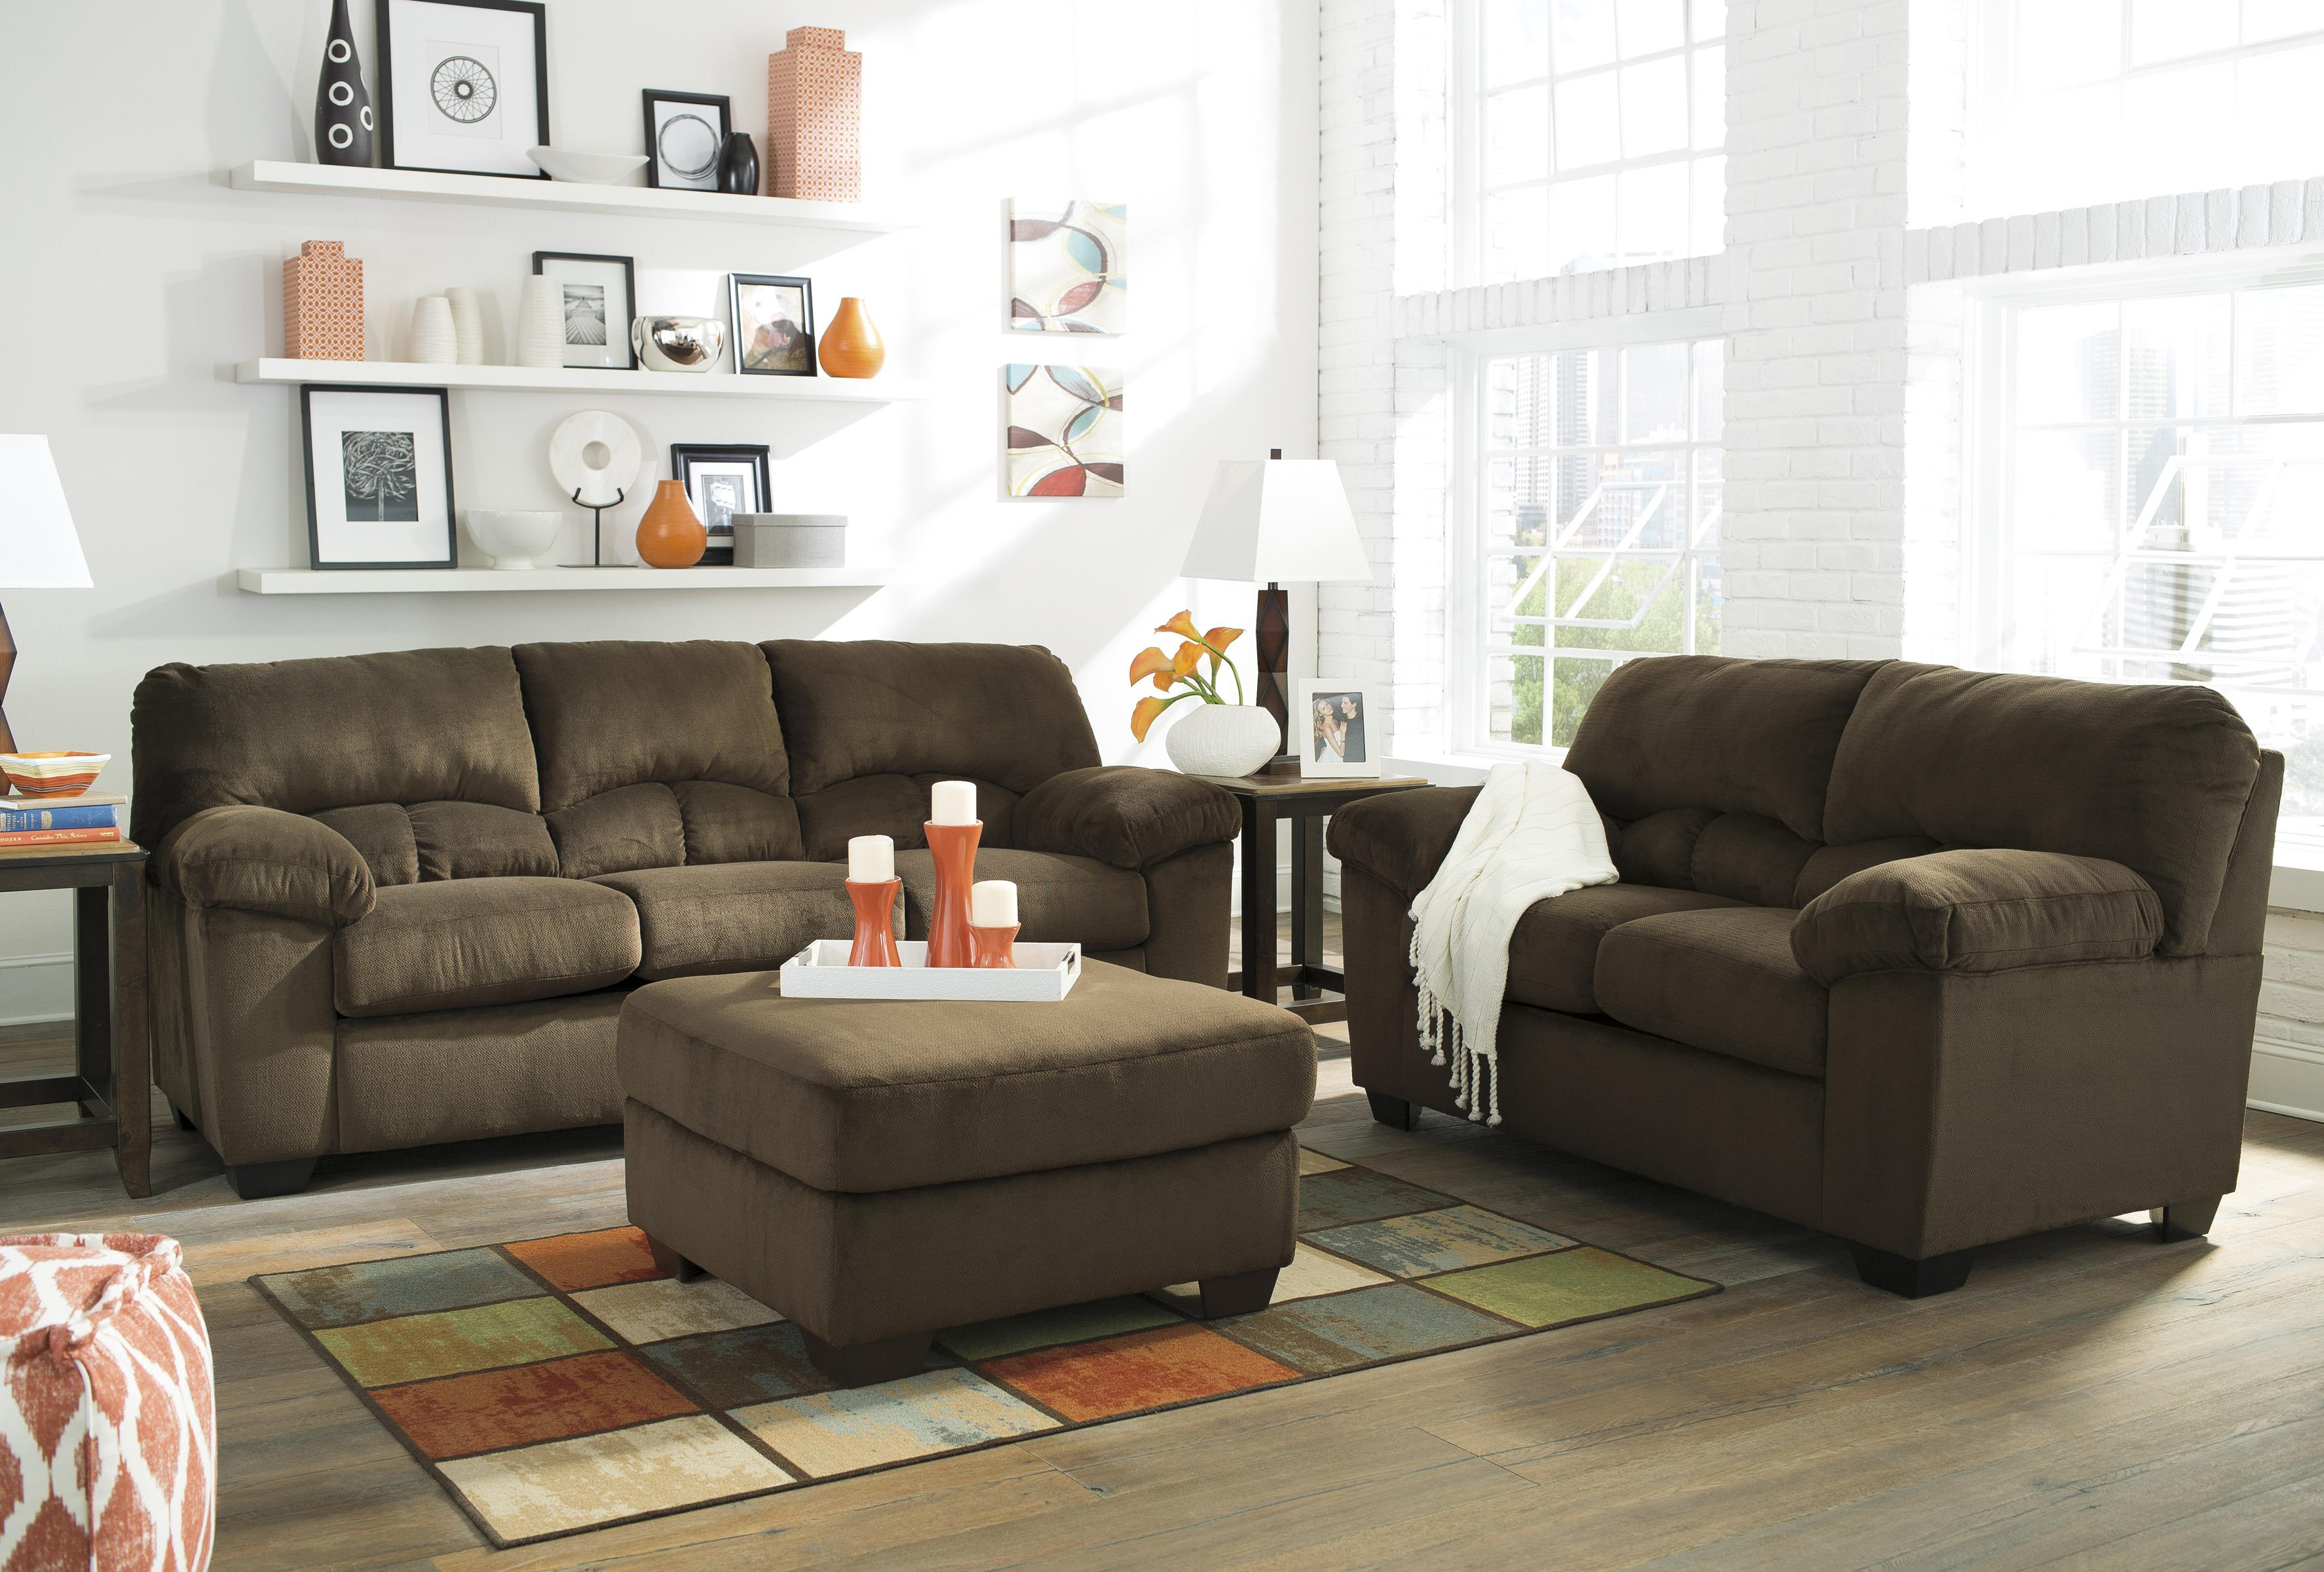 Signature Design By Ashley Dailey 9540338 Casual Contemporary Sofa